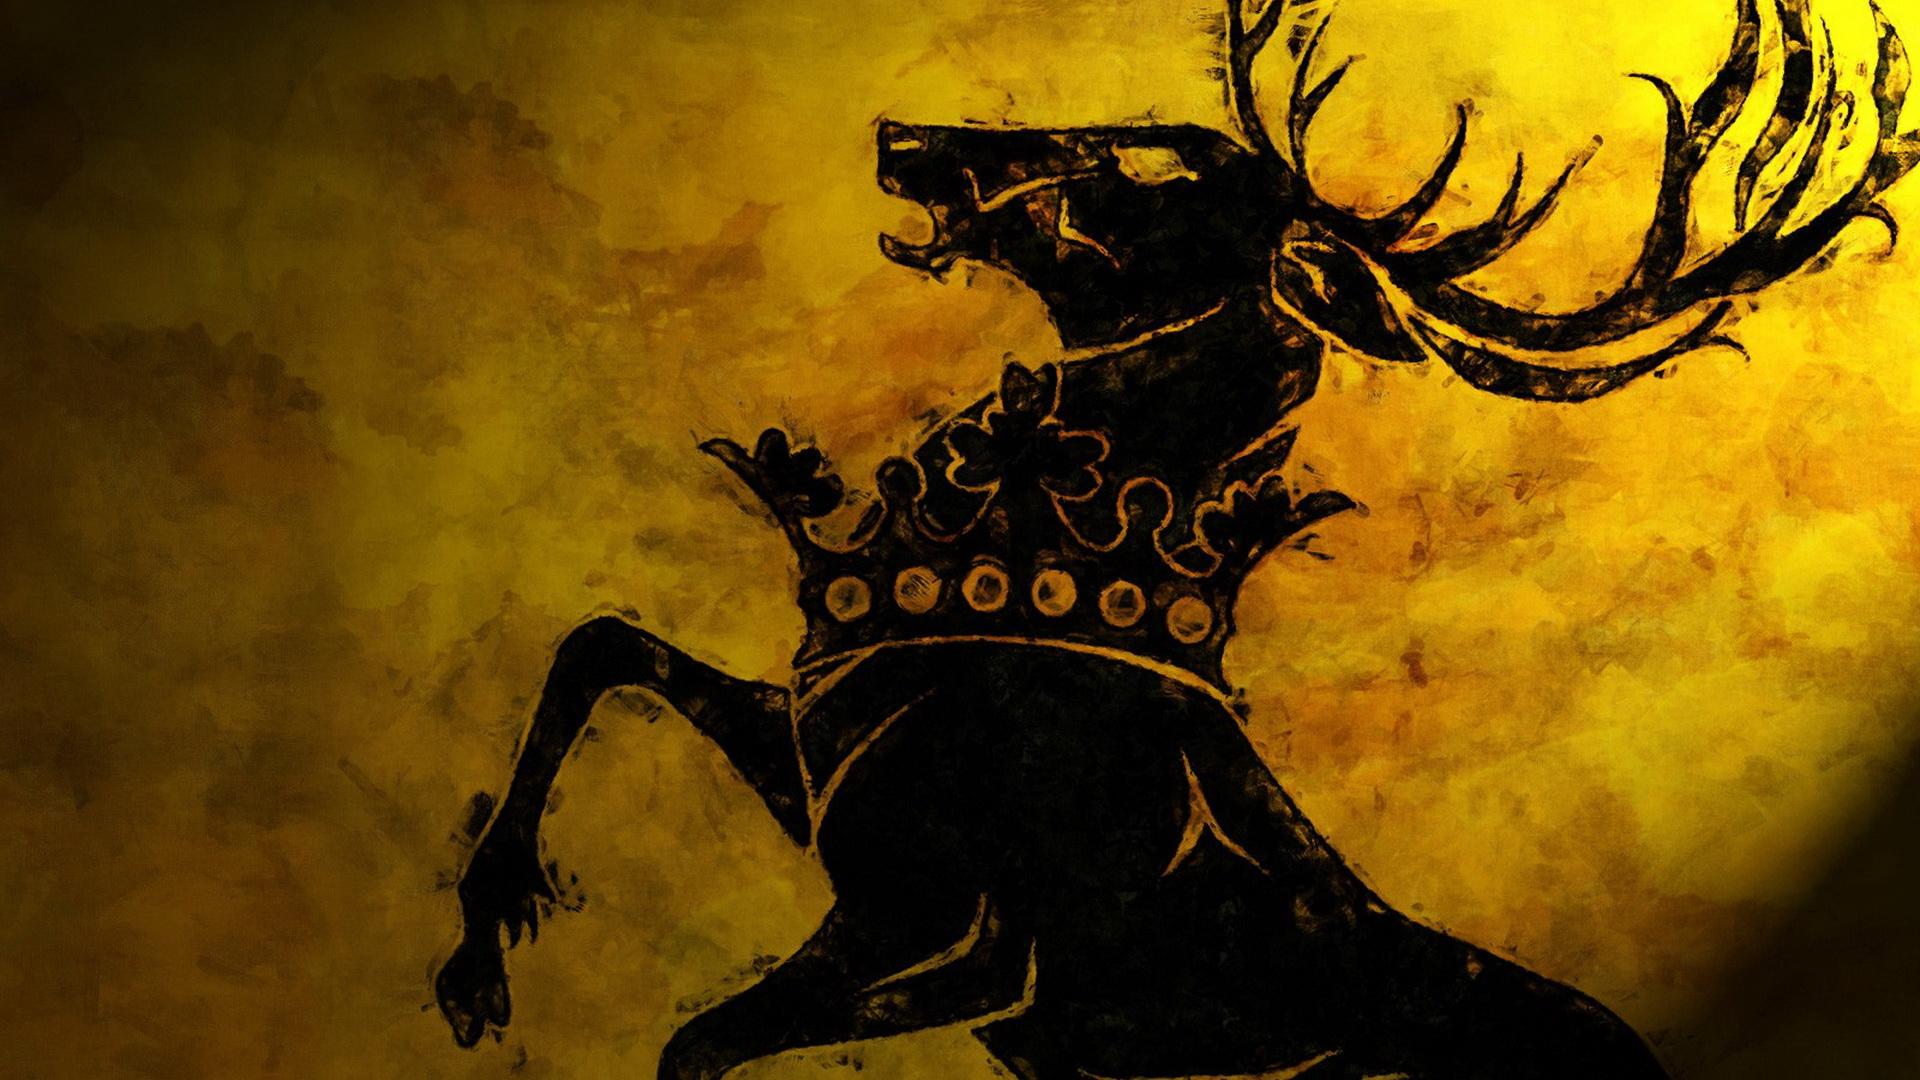 Hd game of thrones wallpaper wallpapersafari Got online hd